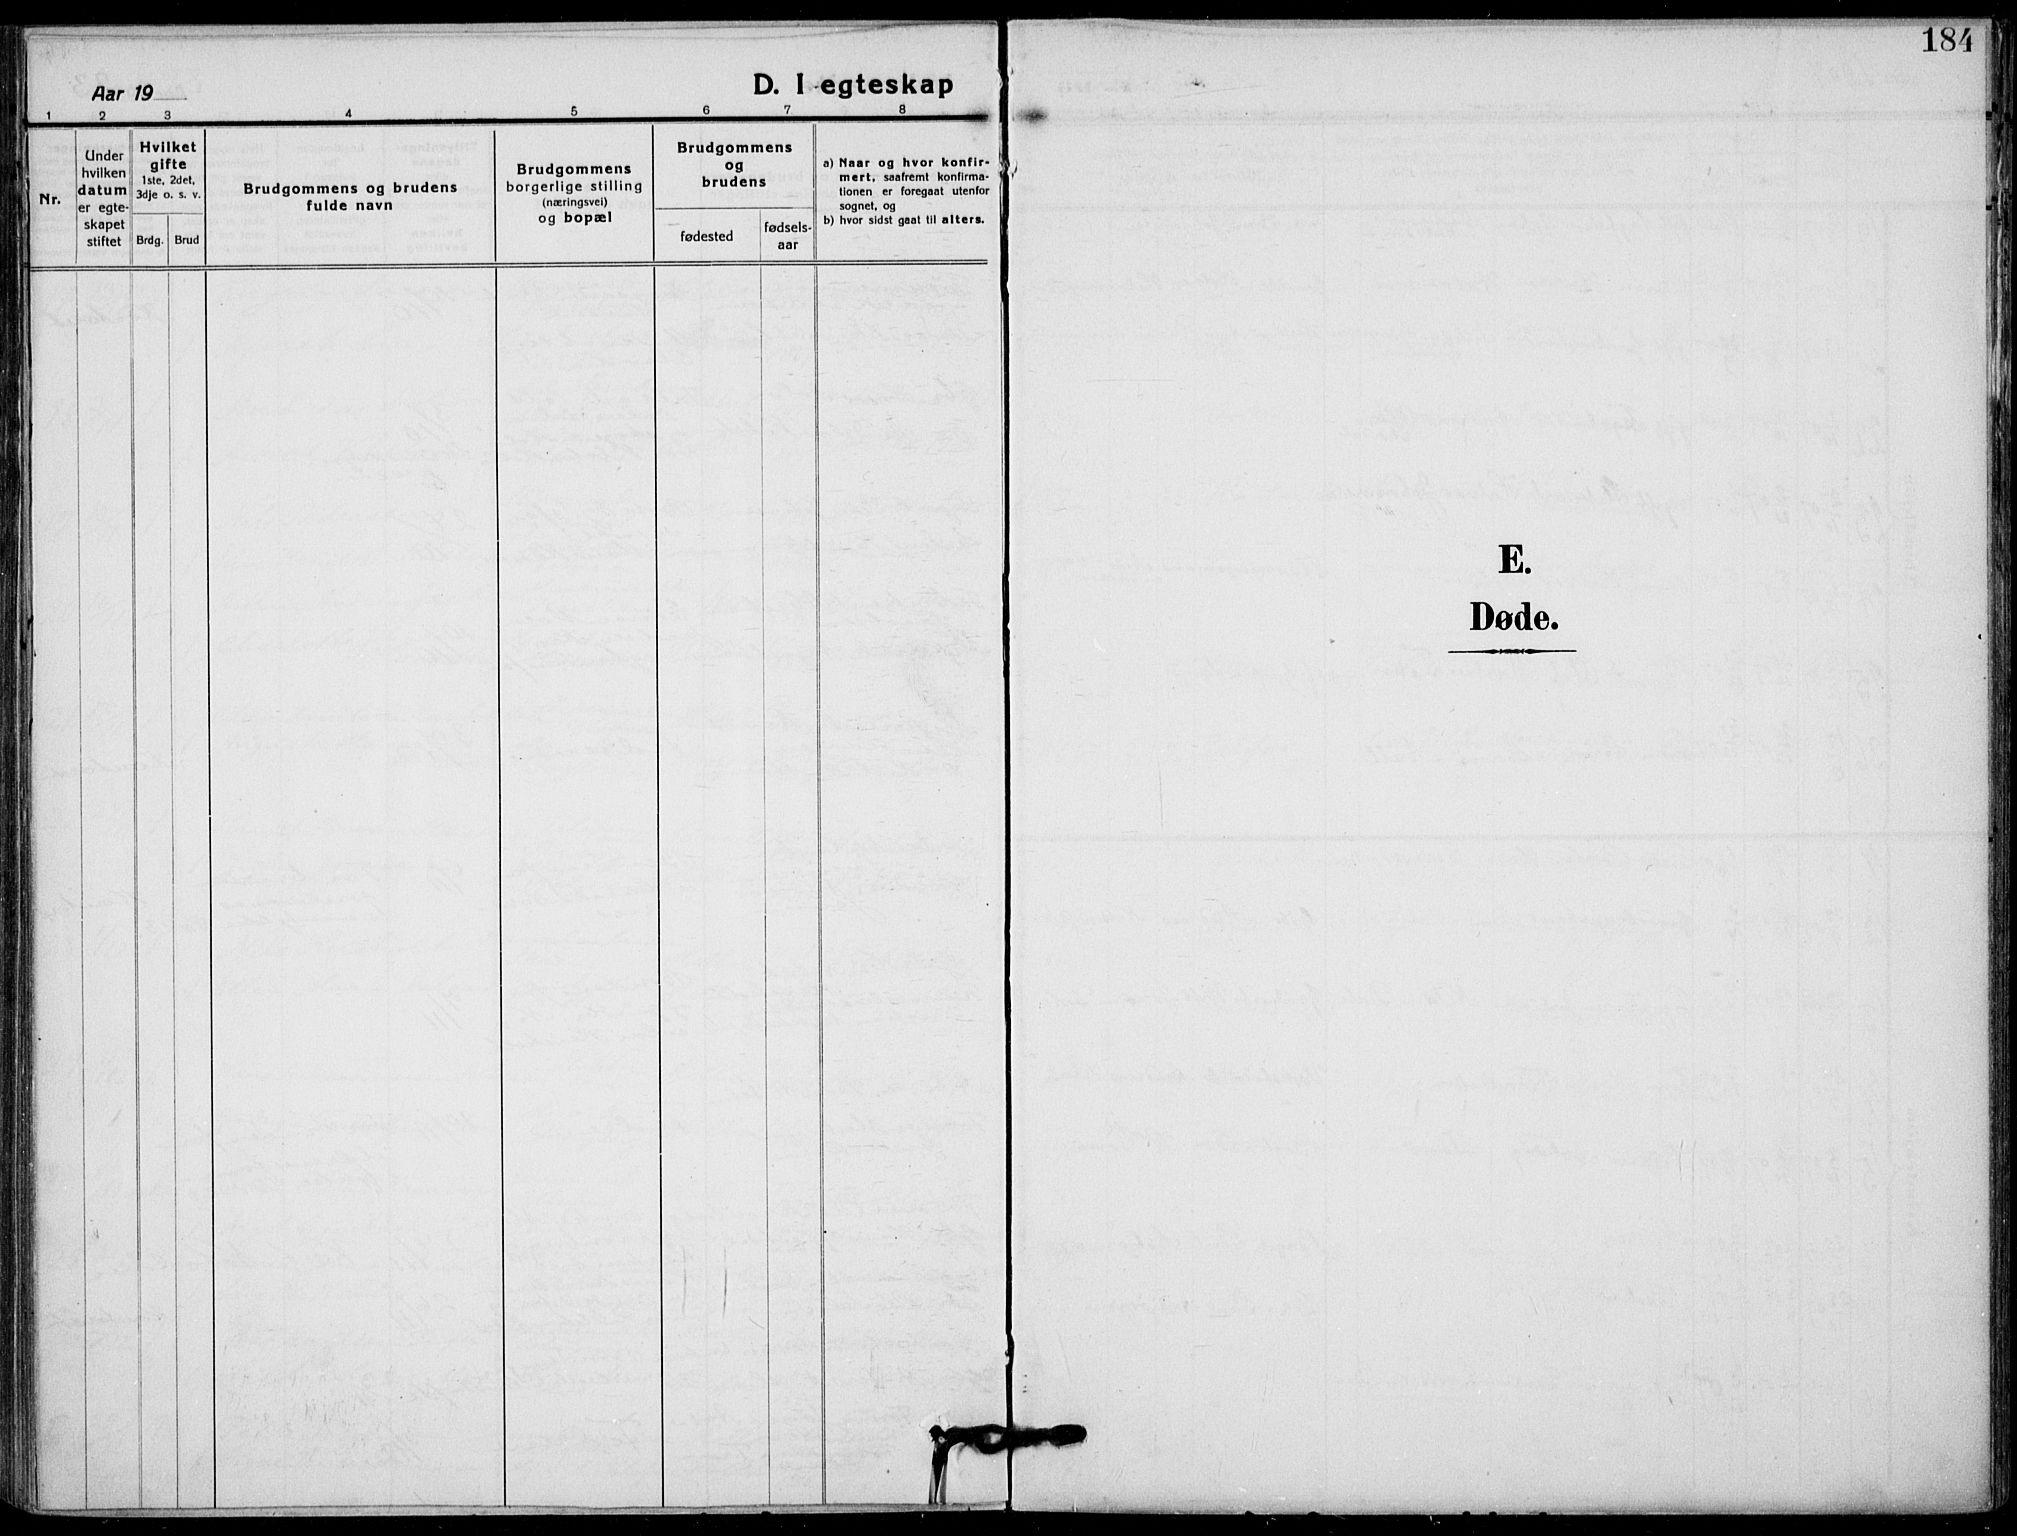 SAKO, Holla kirkebøker, F/Fa/L0012: Ministerialbok nr. 12, 1907-1923, s. 184